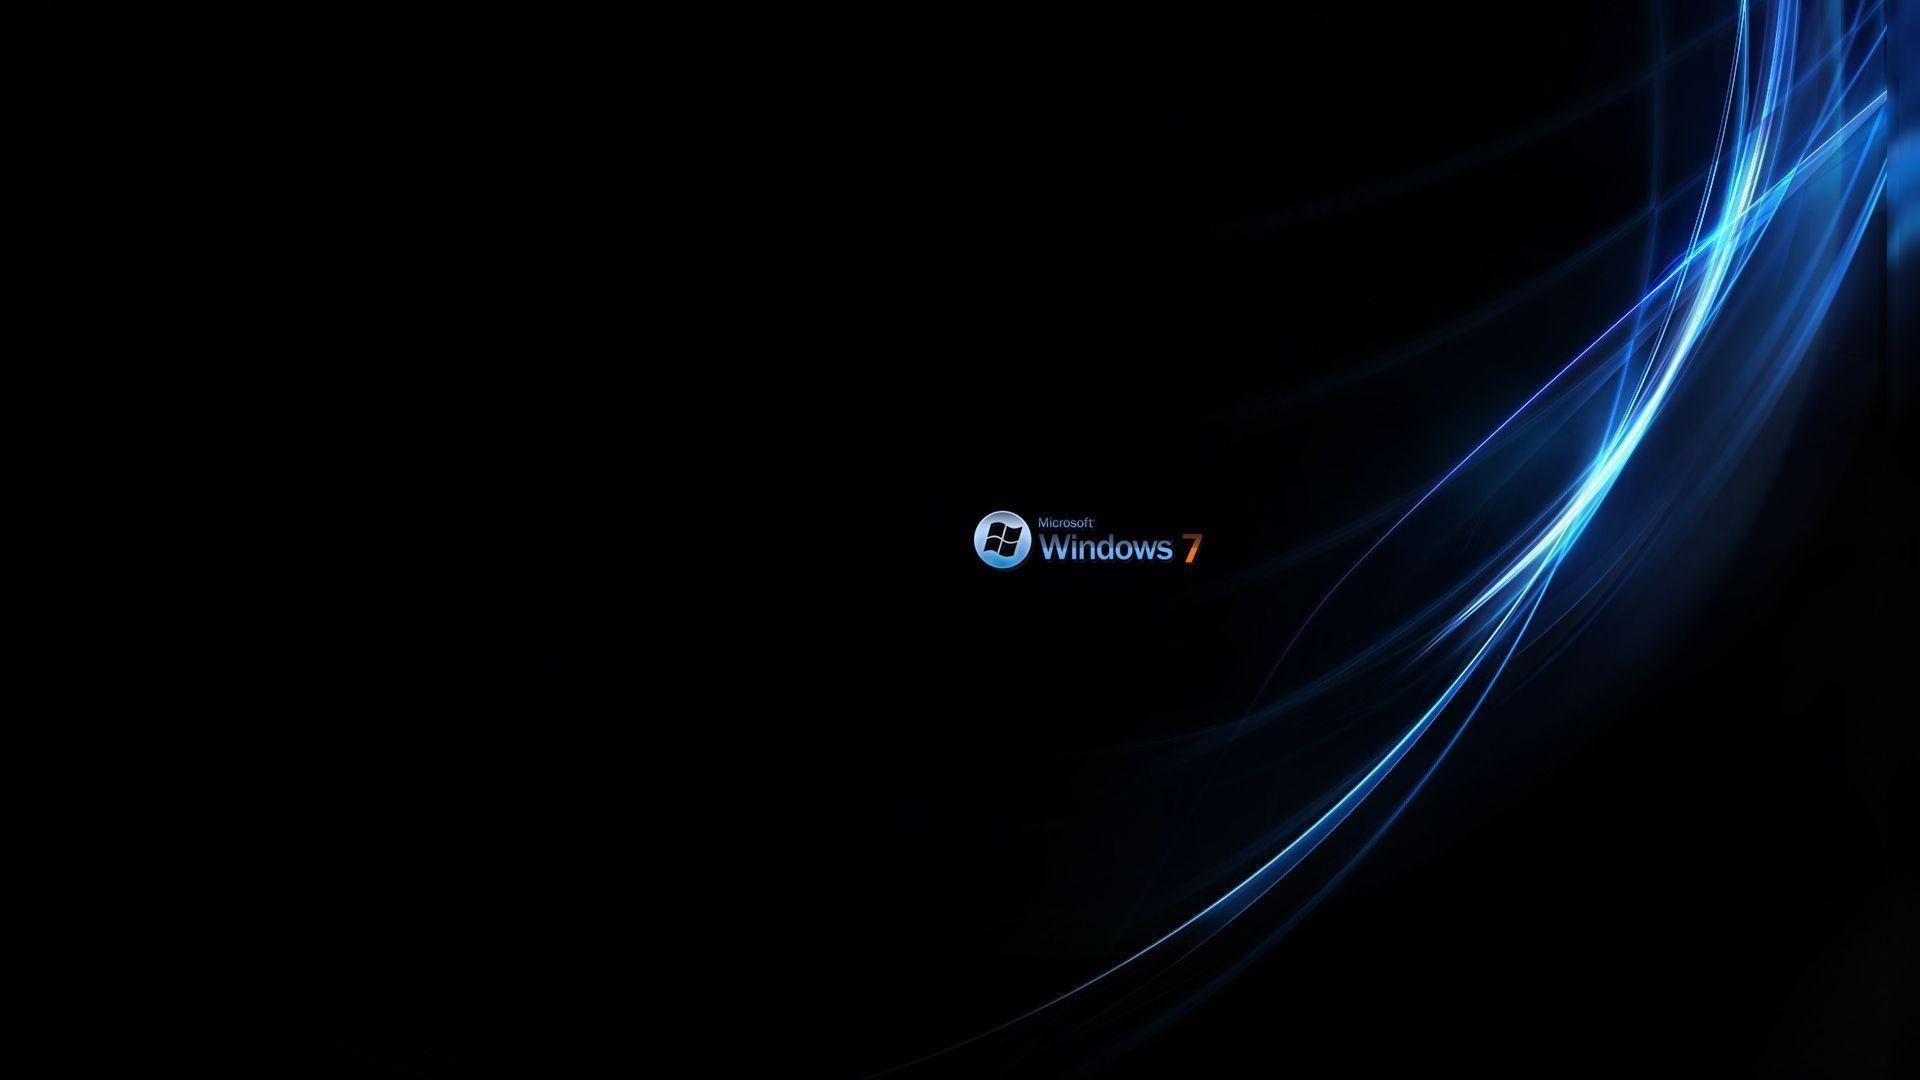 1920x1080 Windows Vista Wallpapers